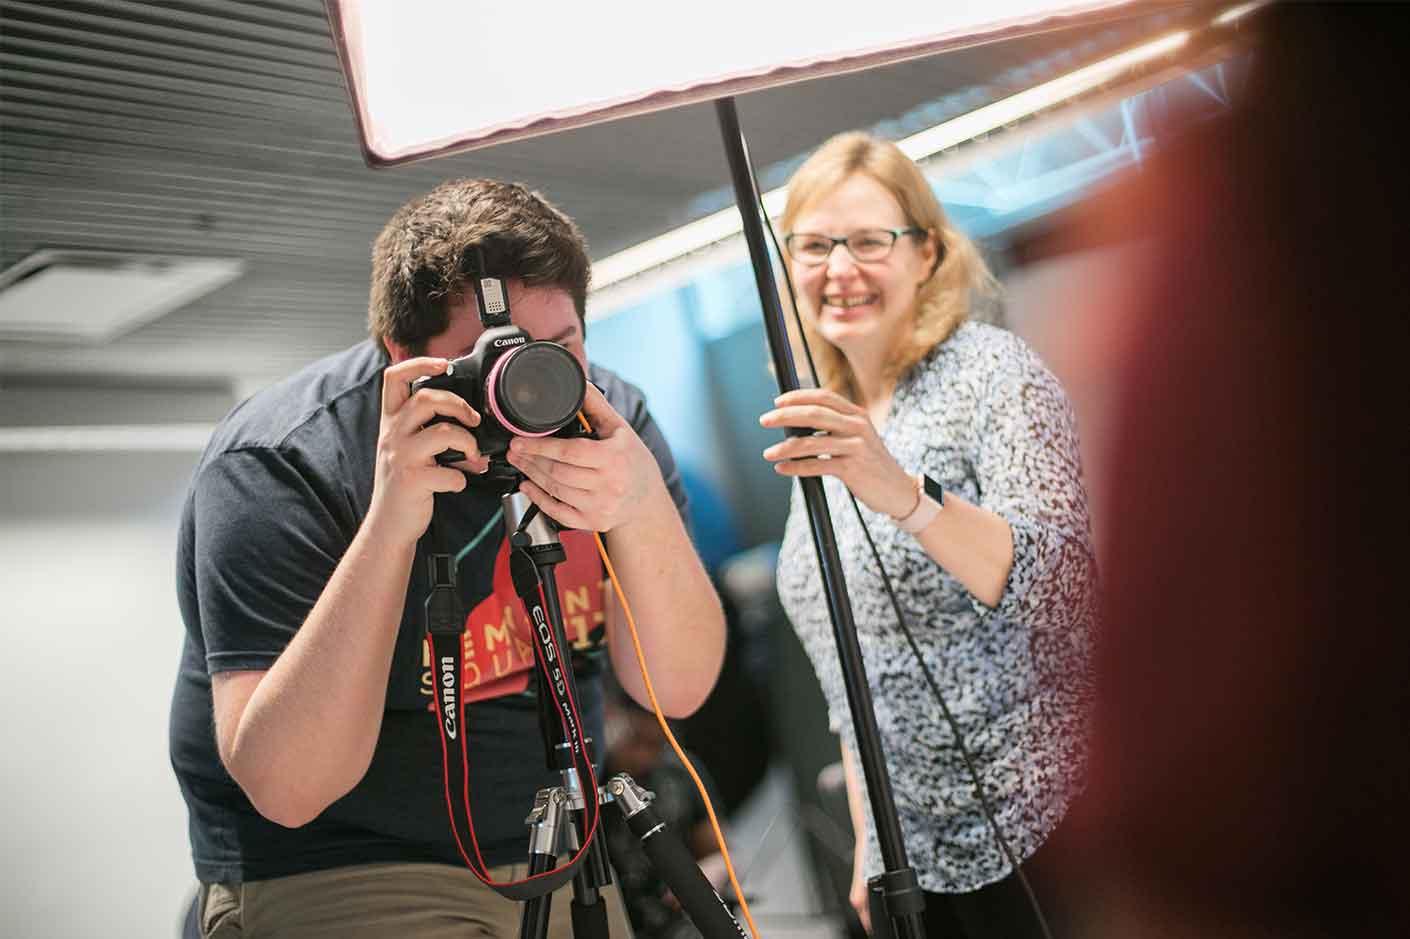 UVF Student taking photos in UVF Photography Studio